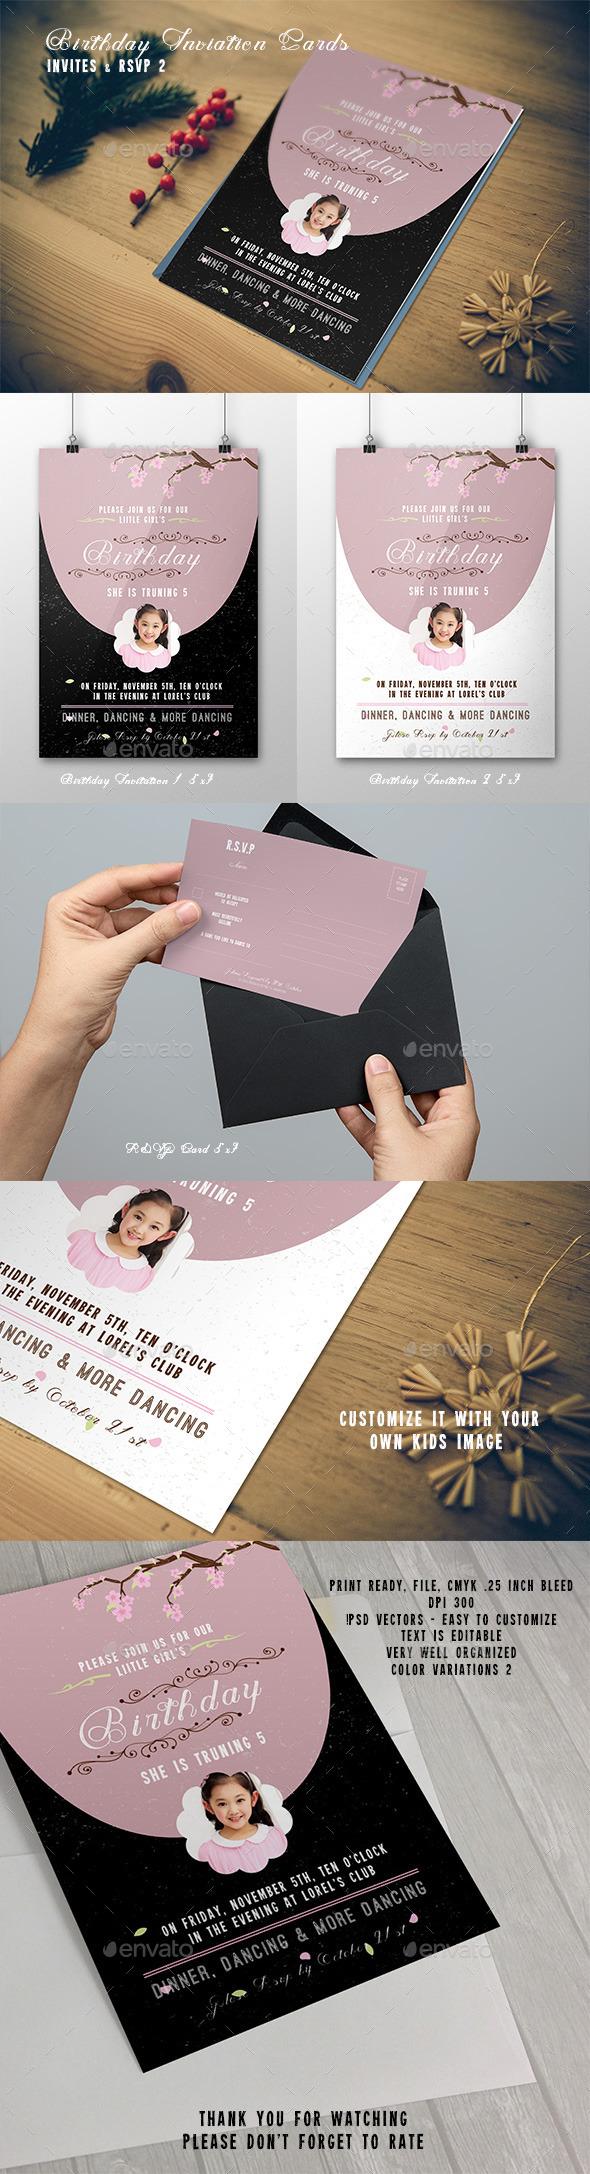 Birthday Invitation & RSVP Cards